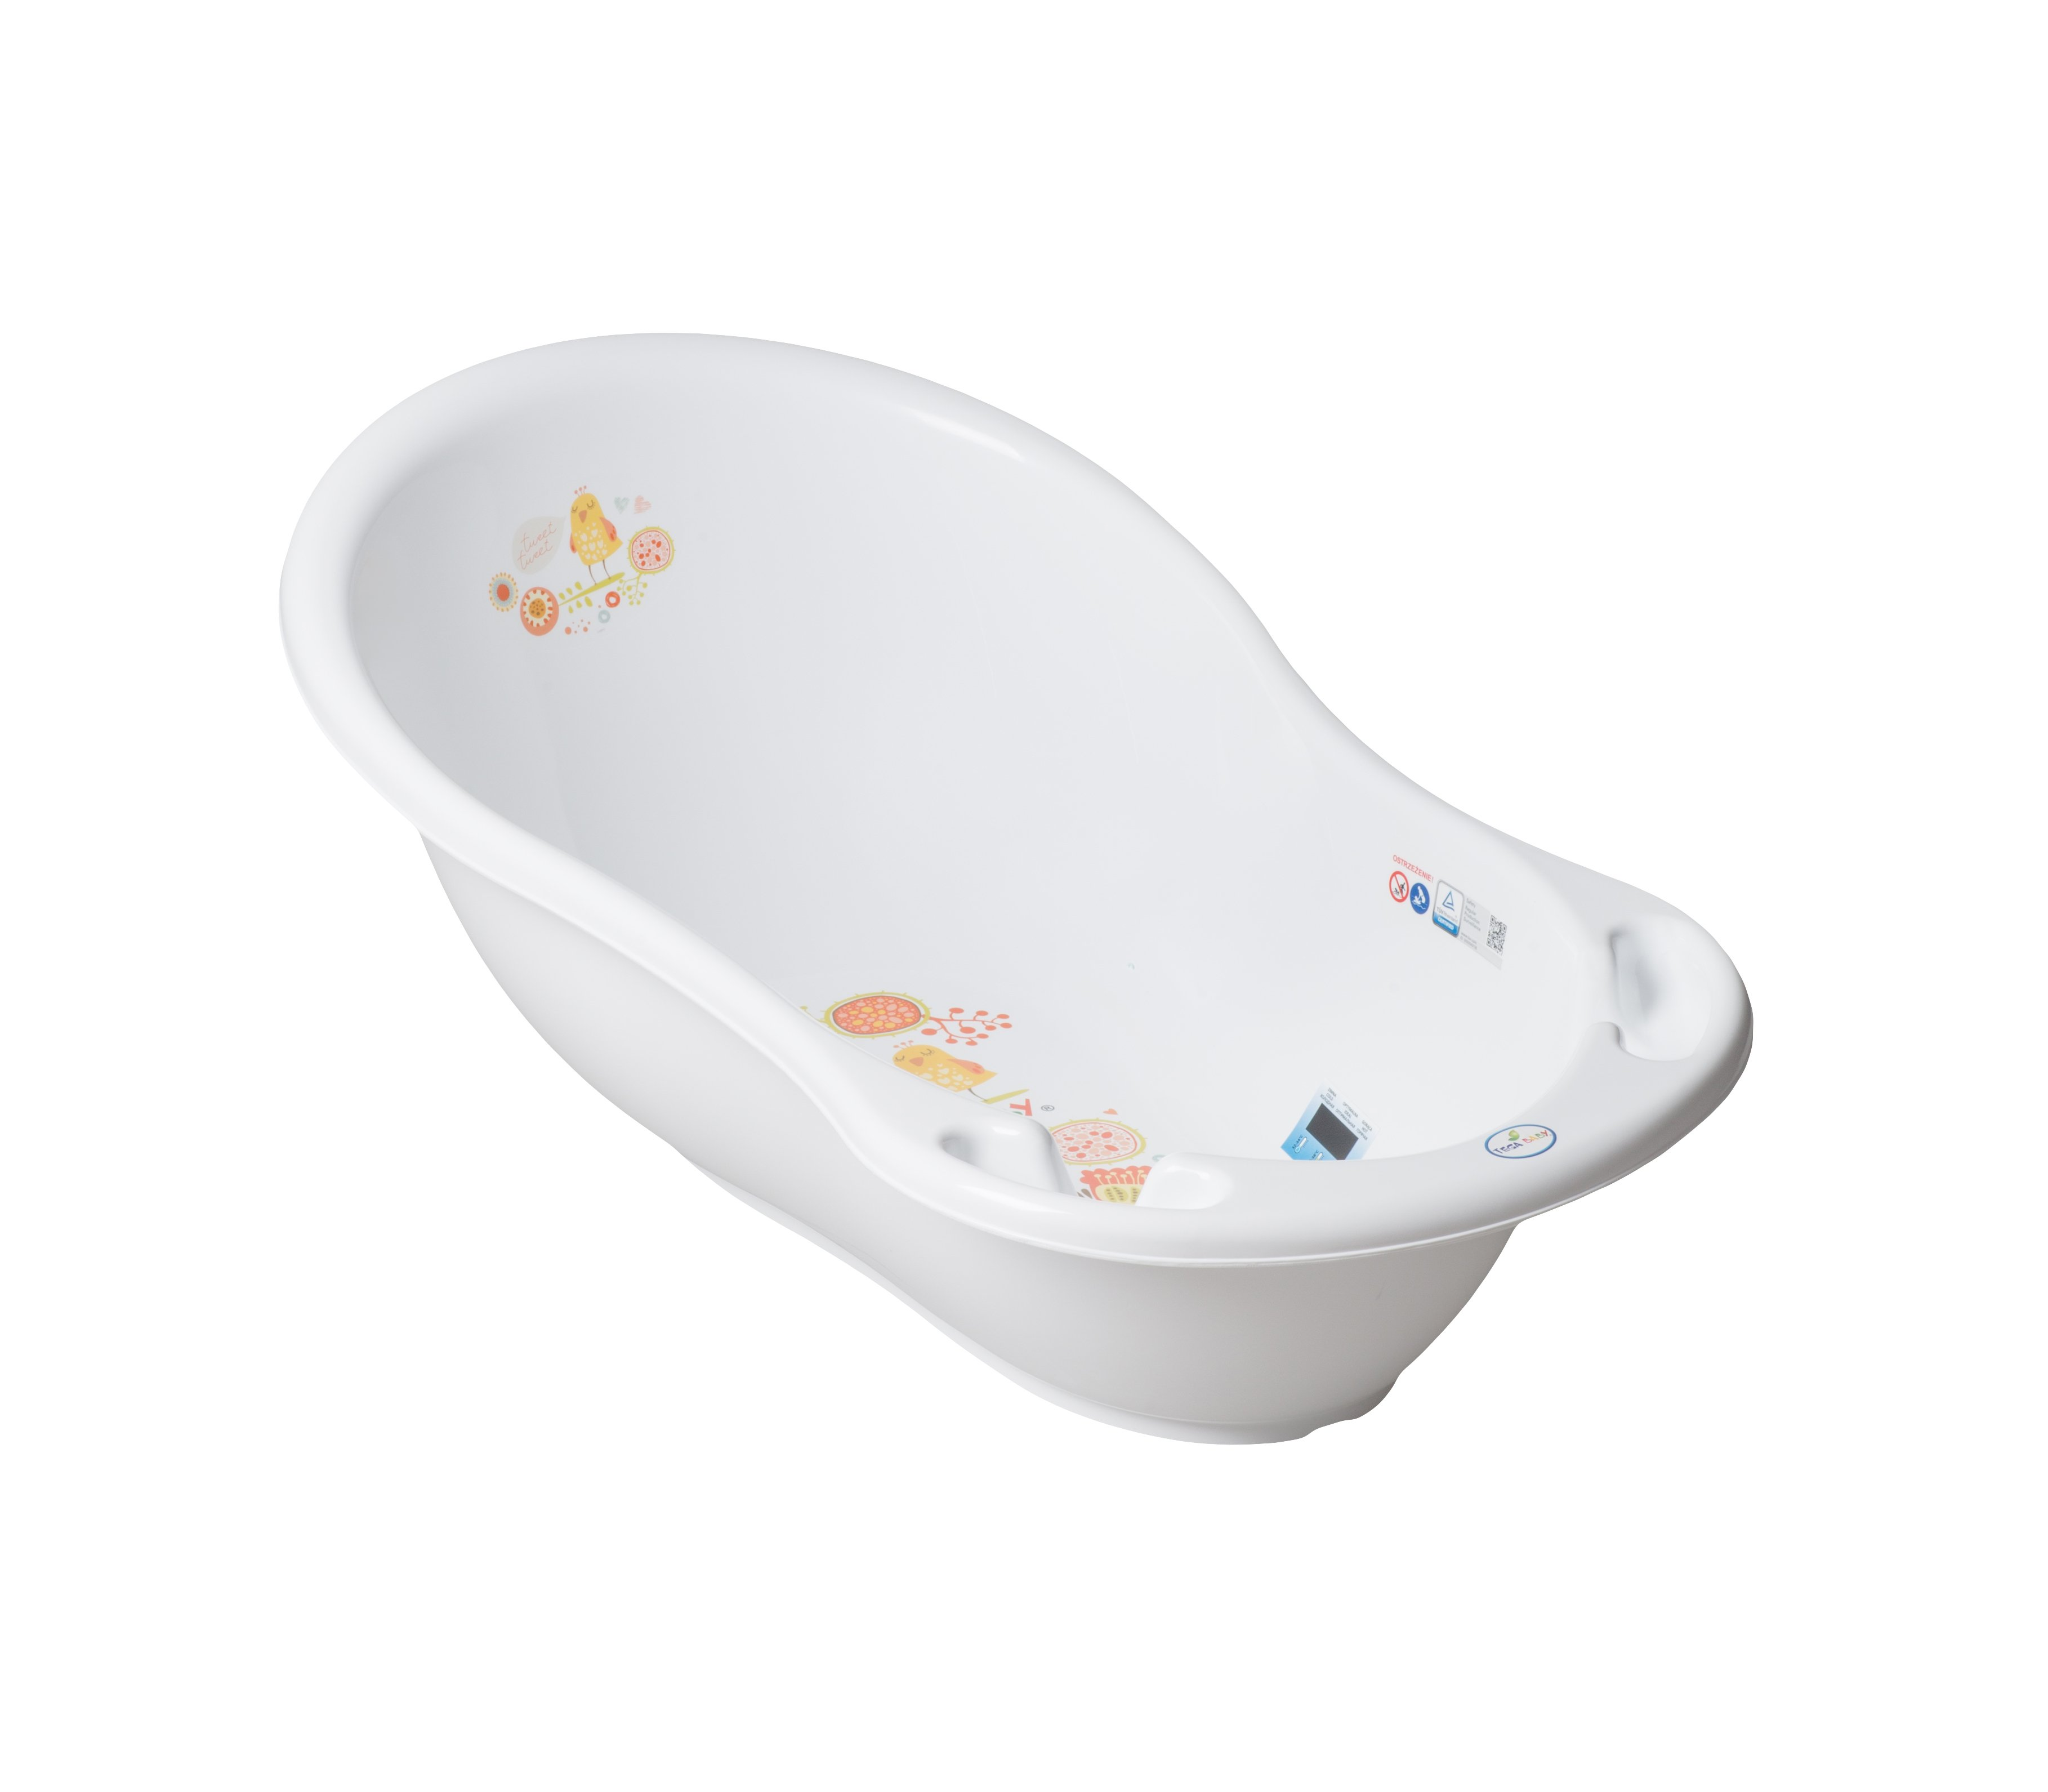 Bērnu vanna ar termometru 86 cm TegaBaby FOLK white FL-004